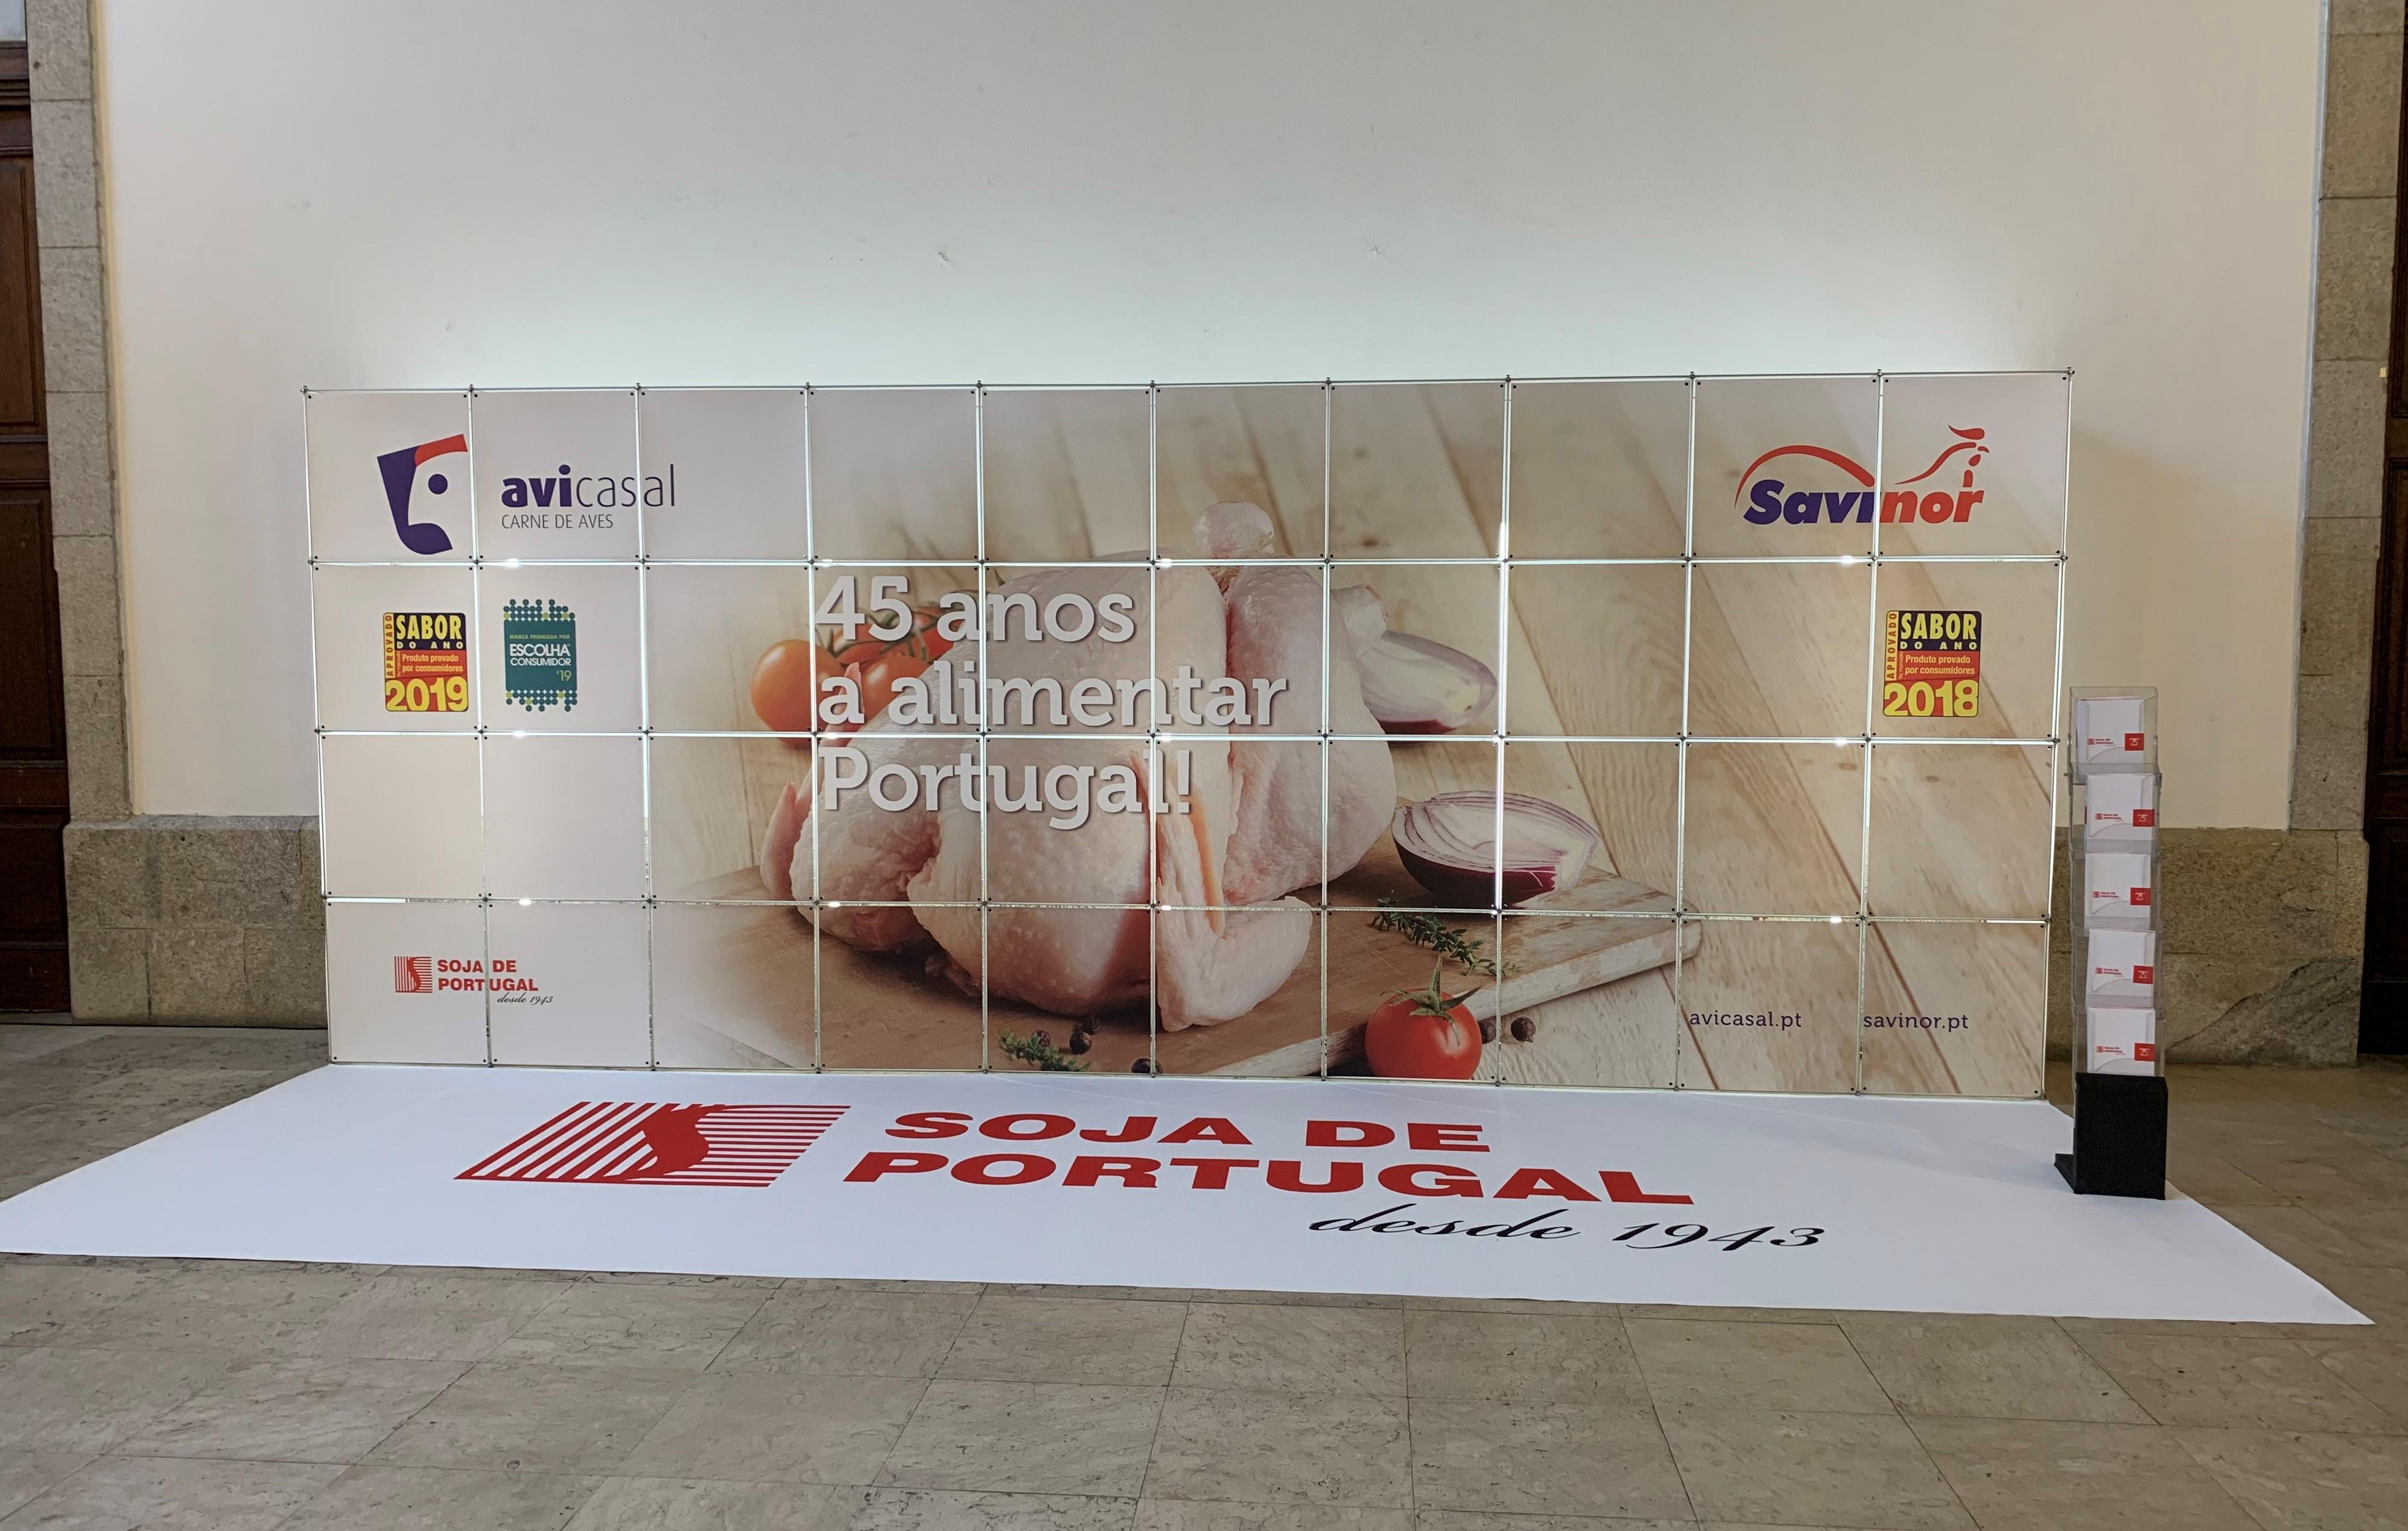 SOJA DE PORTUGAL, AVICASAL e SAVINOR apoiam II Congresso Internacional de Avicultura